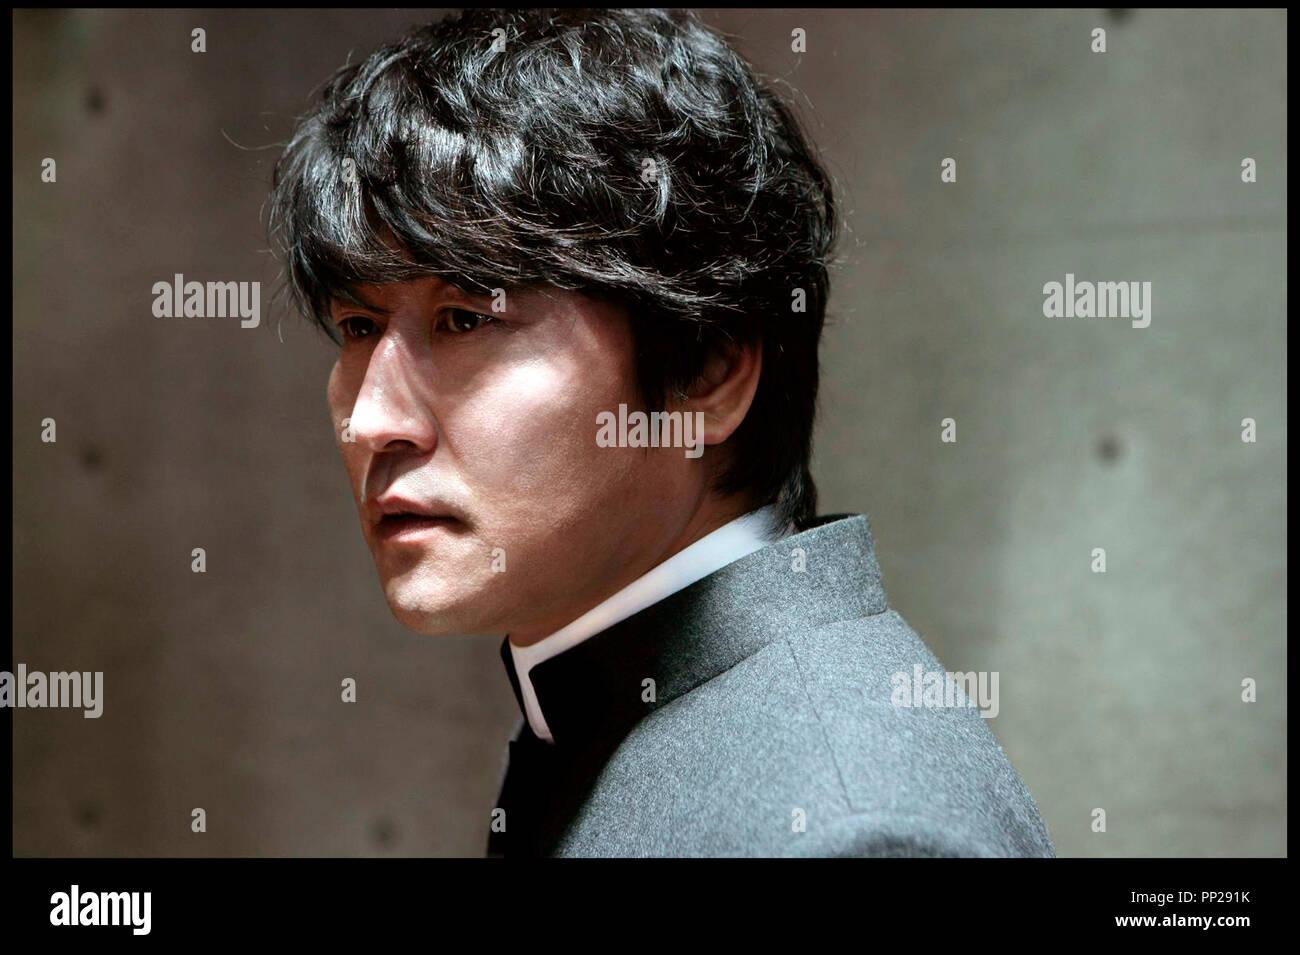 Prod DB © Moho Film / DR THIRST, CECI EST MON SANG (BAKJWI - THIRST) de Park Chan-Wook 2009 Corée du Sud Song Kang-Ho - Stock Image